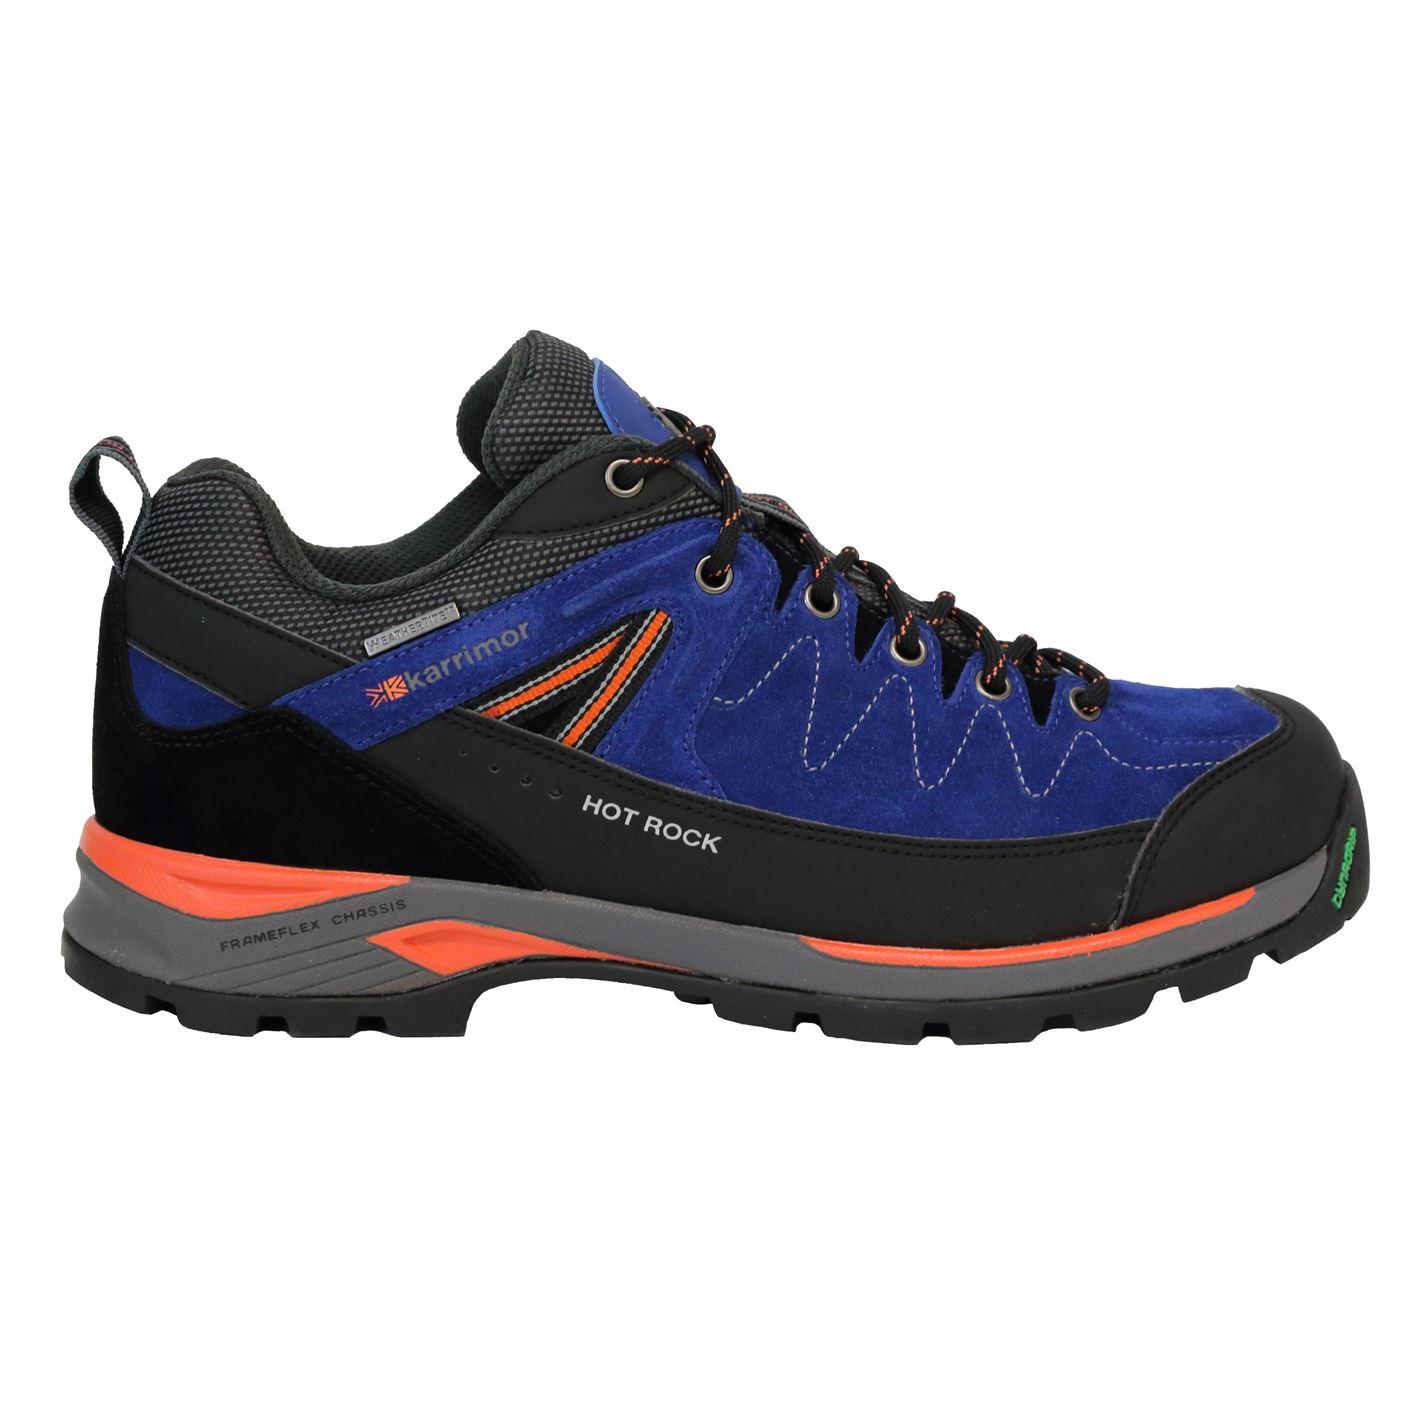 0ac6462c83 Karrimor Hot Rock Low pánské Walking Shoes